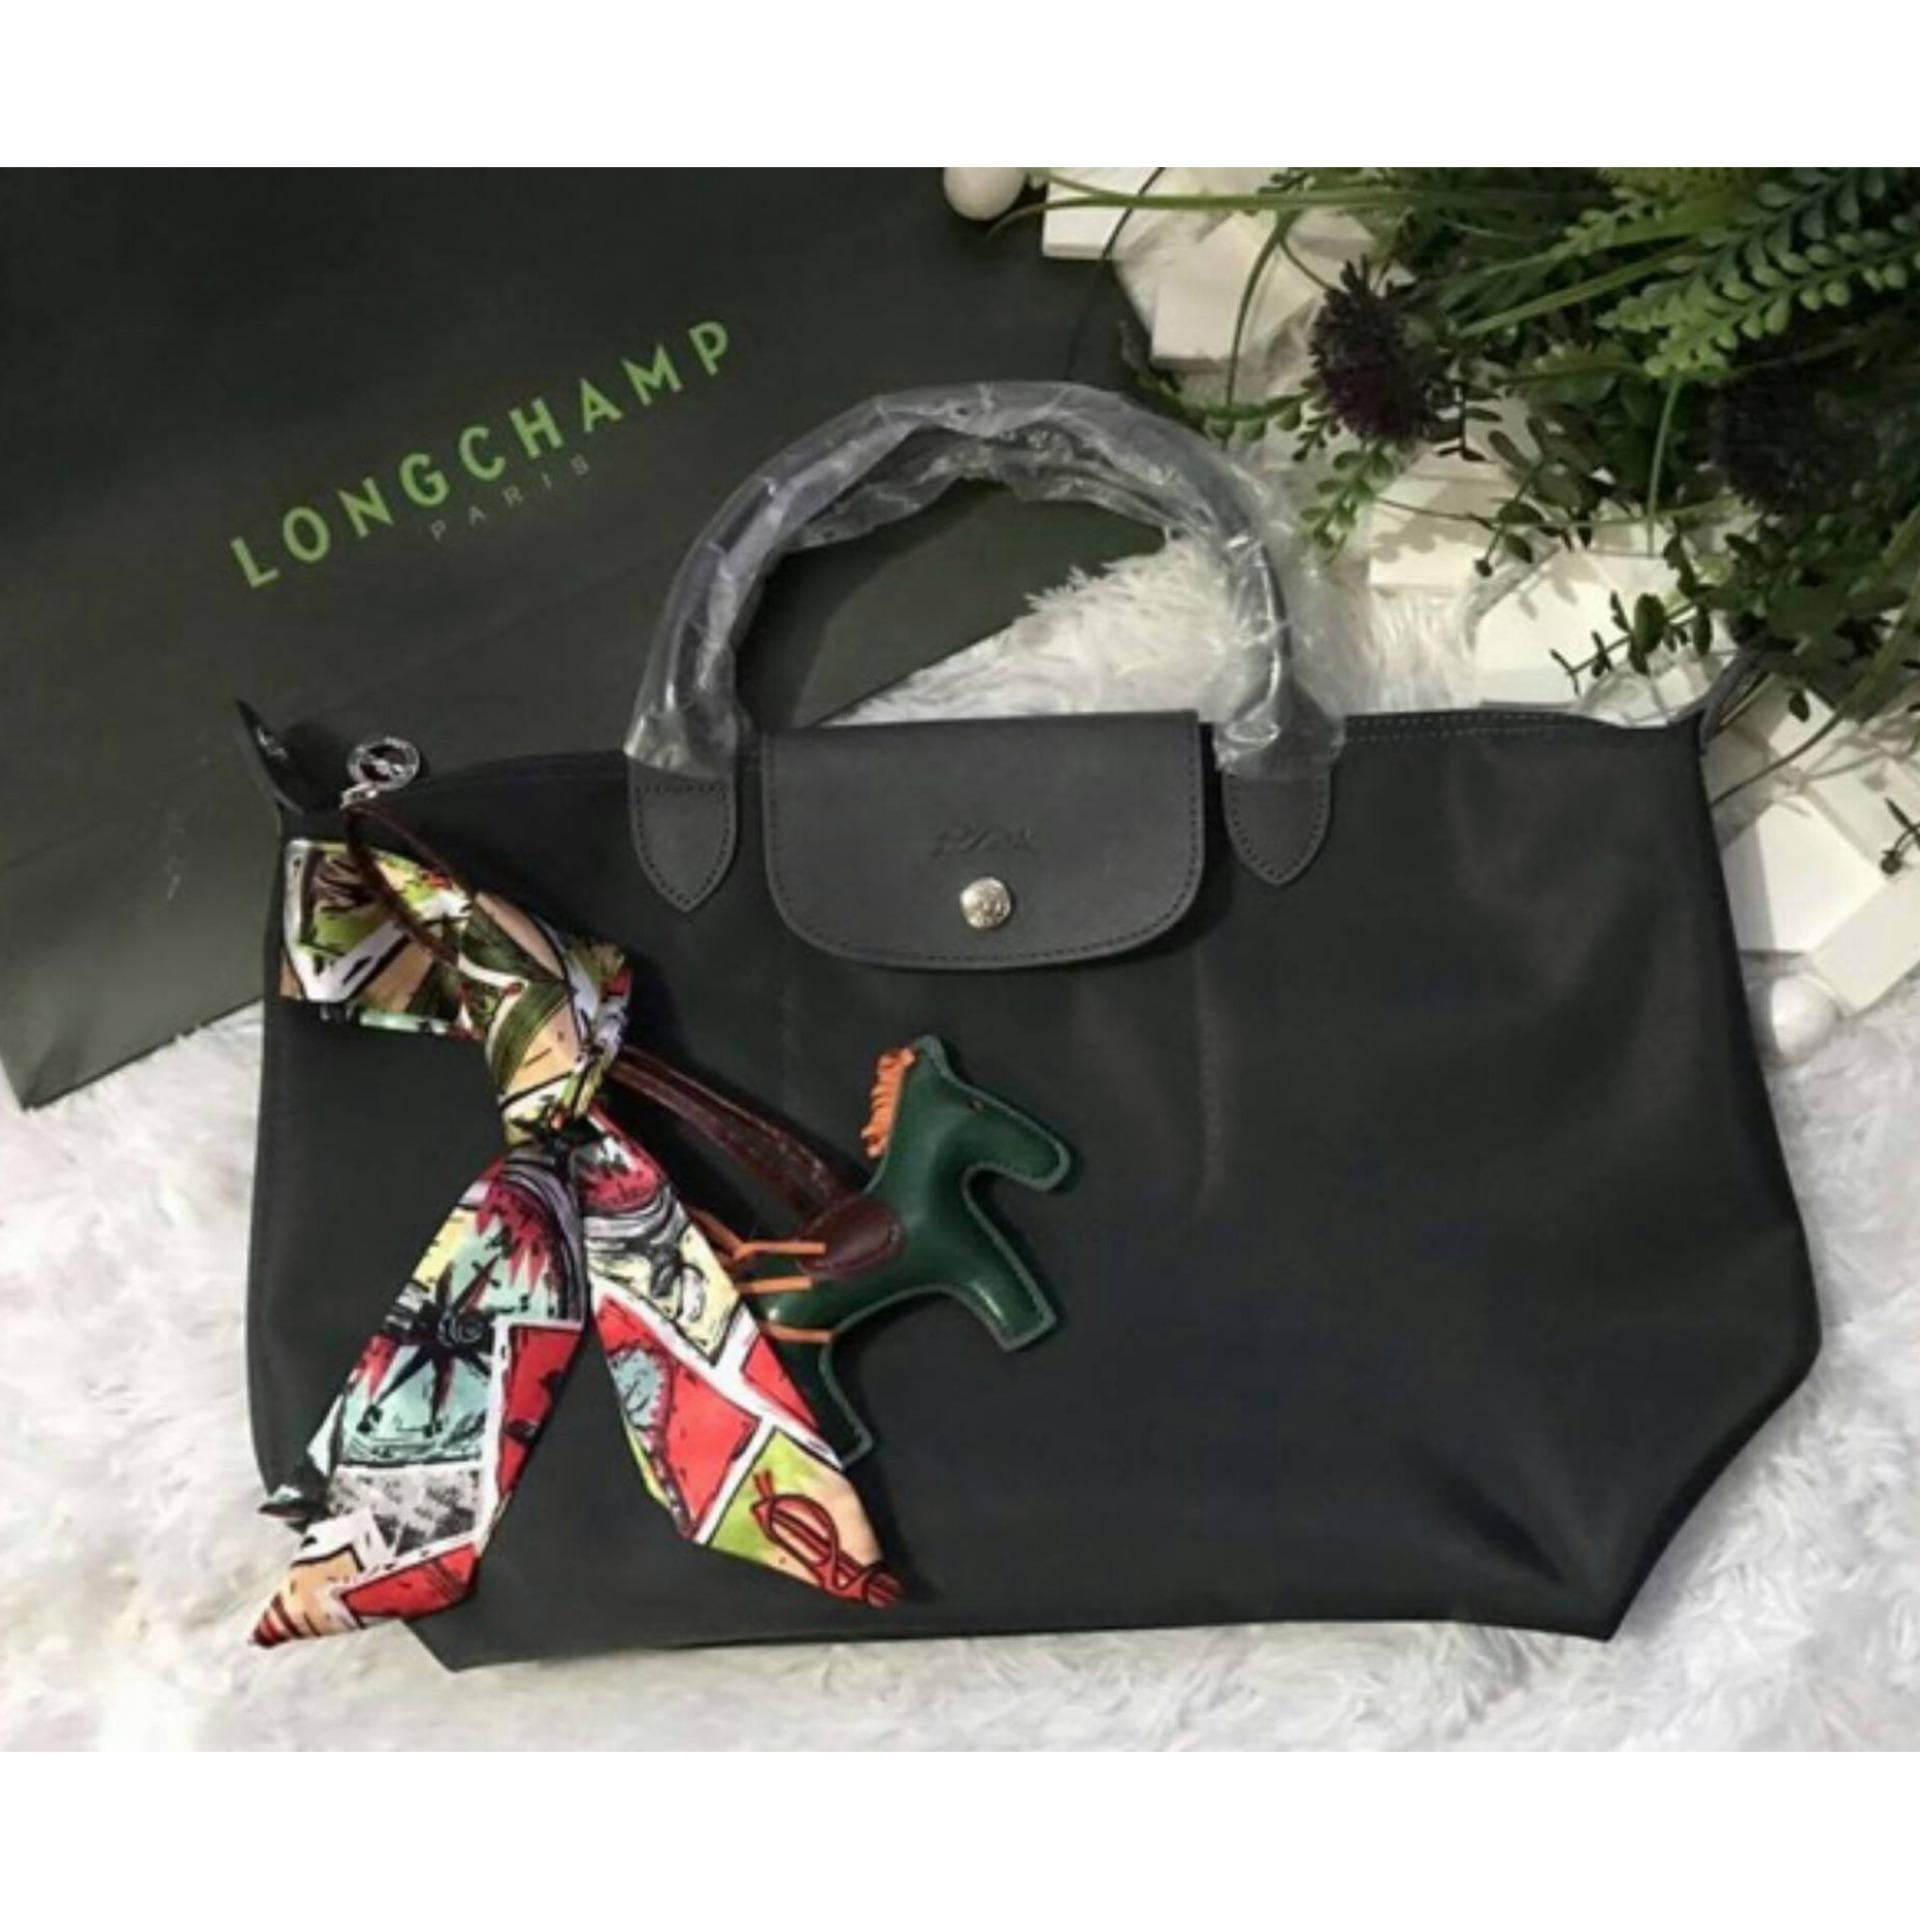 Philippines Long Champ Neo Pliage Medium Short Handle Free Twilly Longchamp Black Authentic Rodeocharm